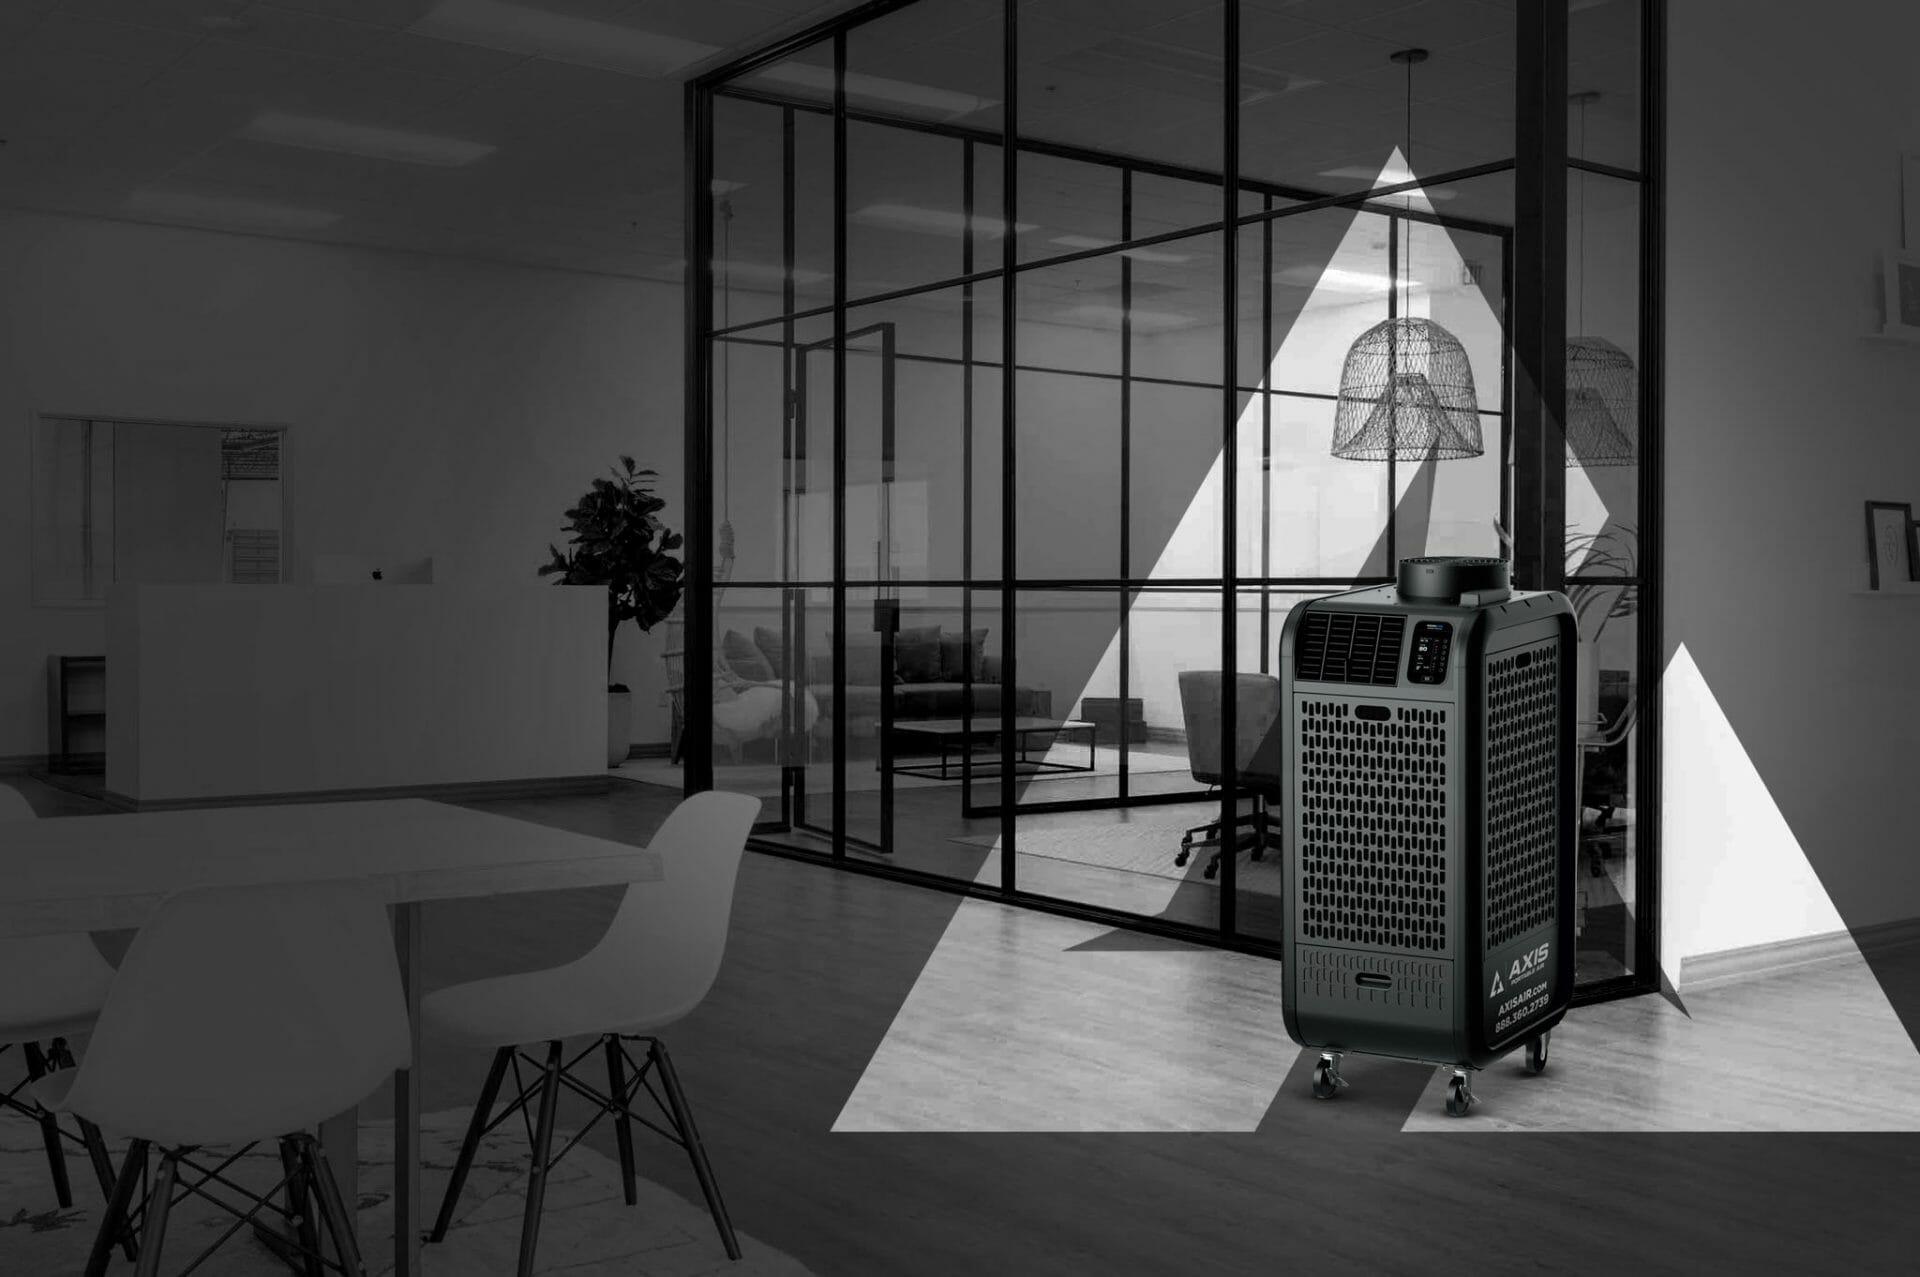 Axis Portable Air Offices